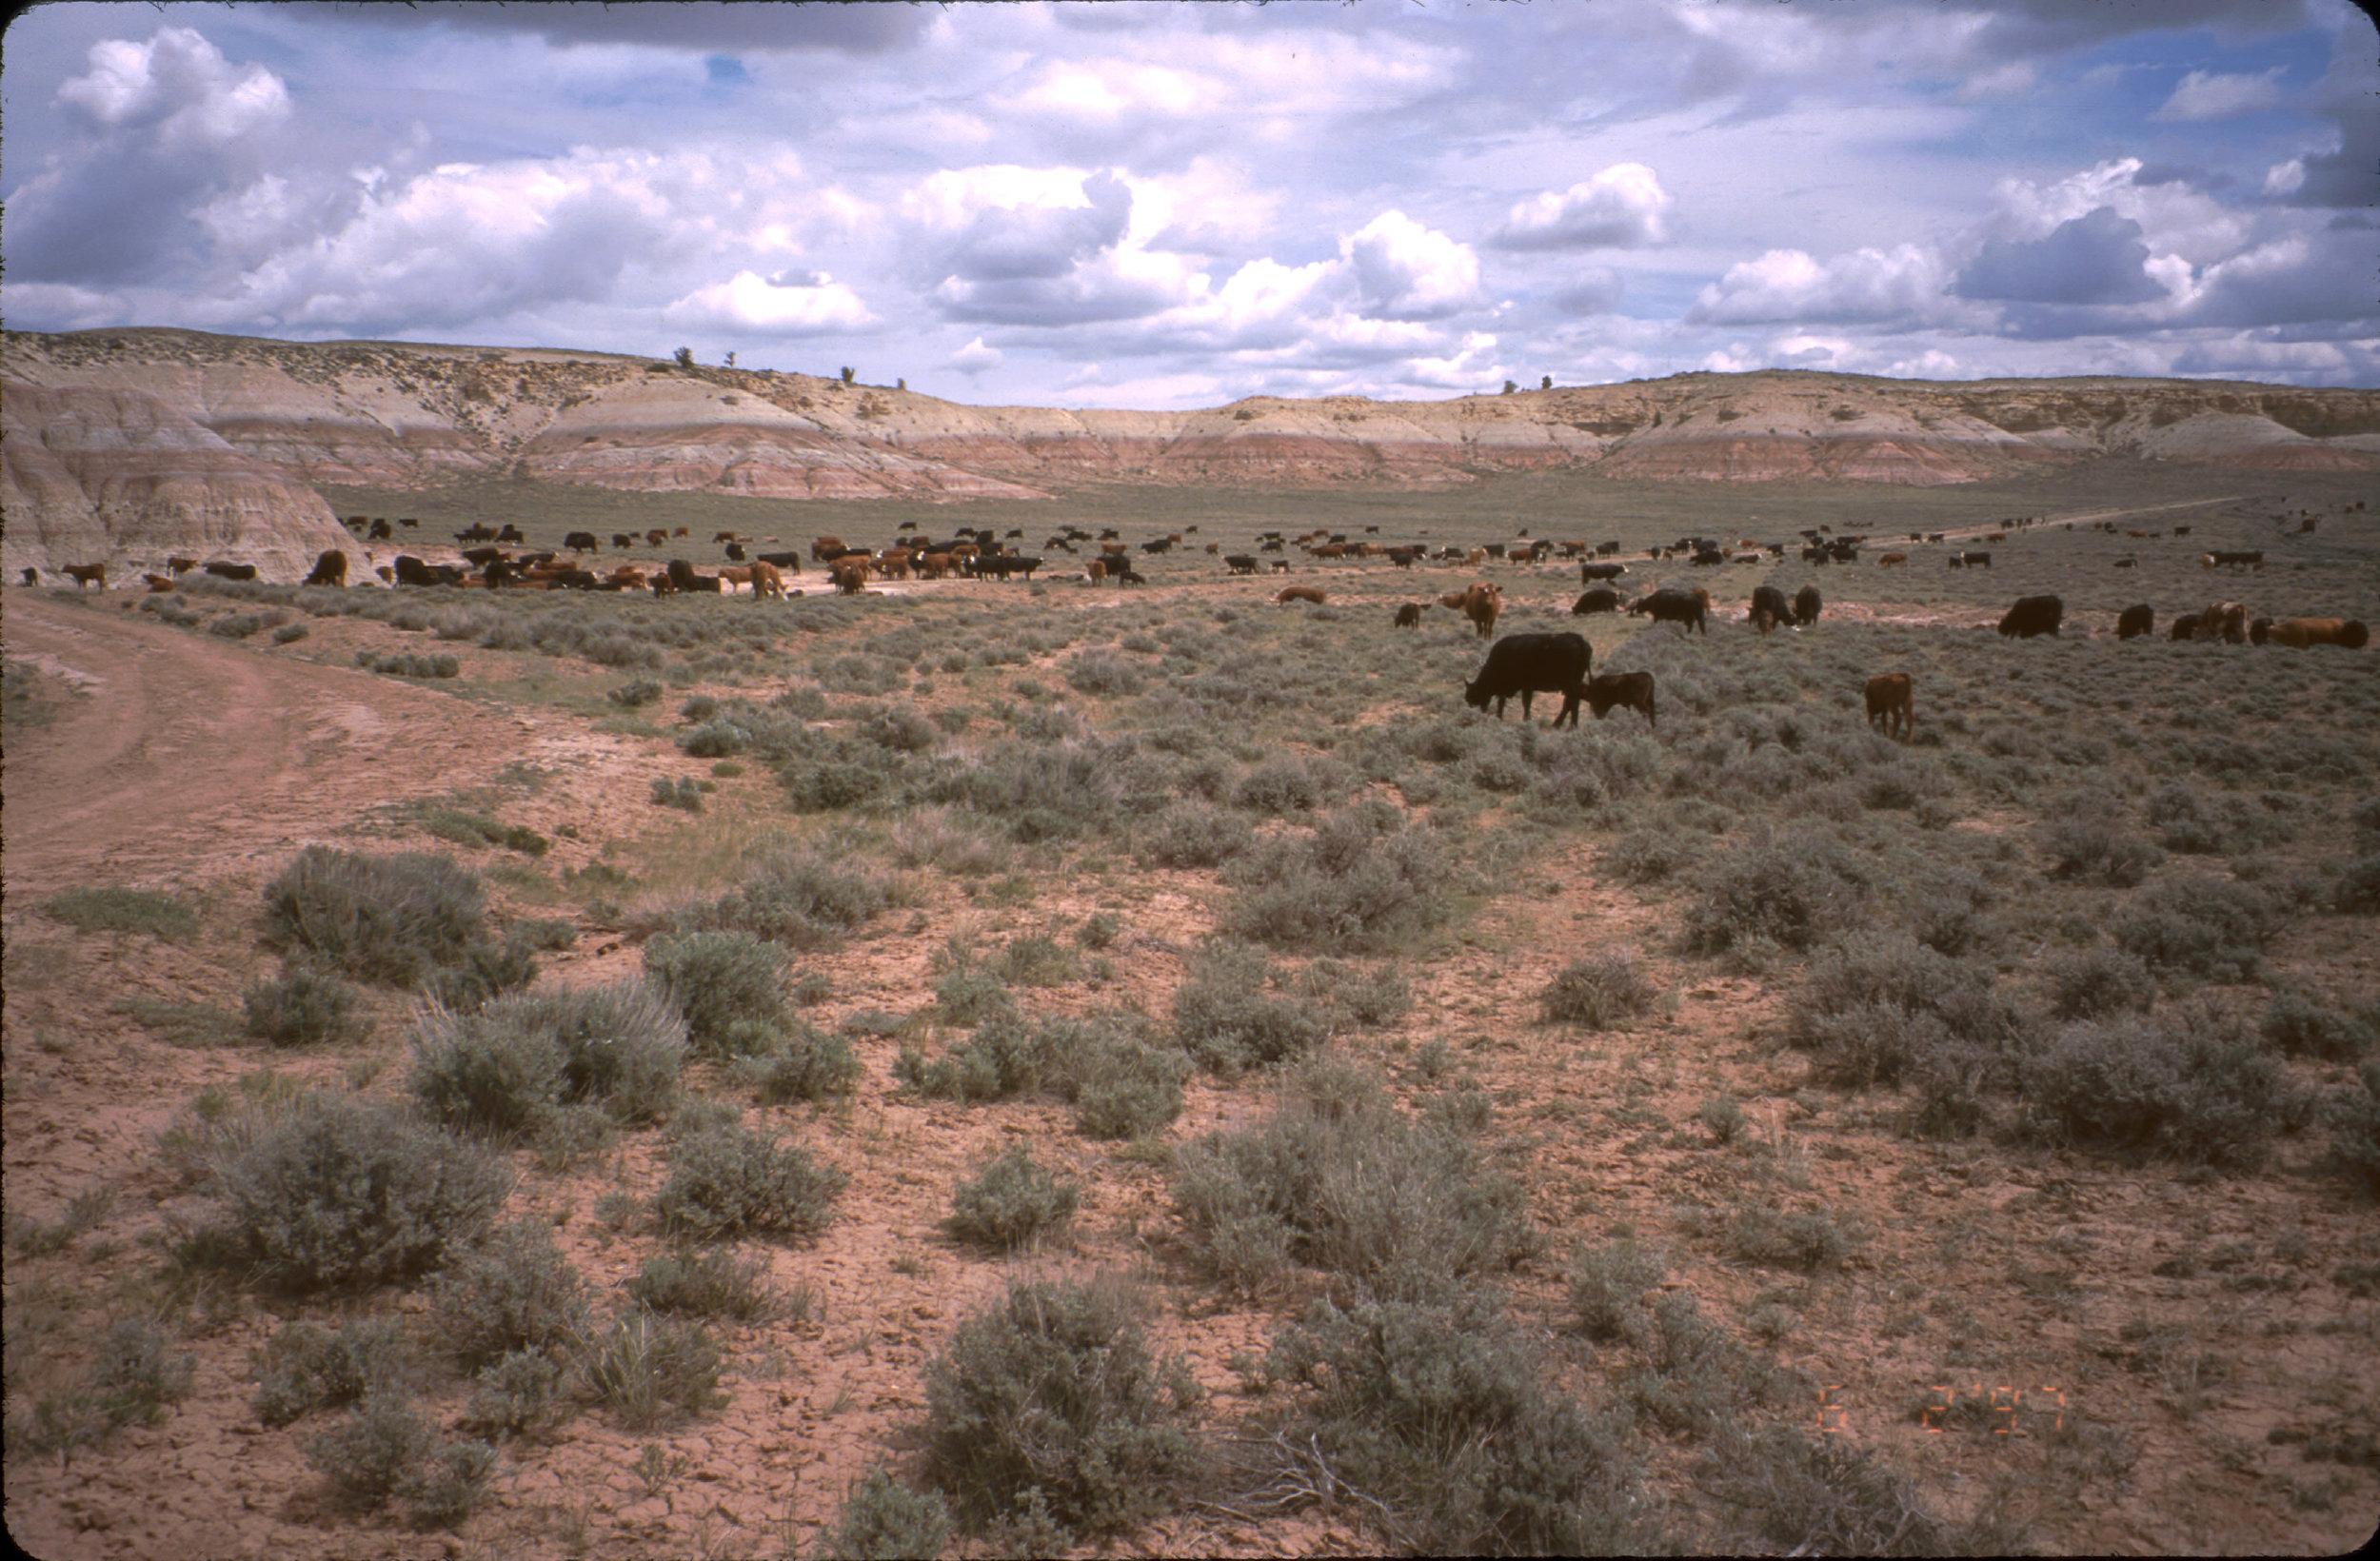 Cows on the Range.jpg